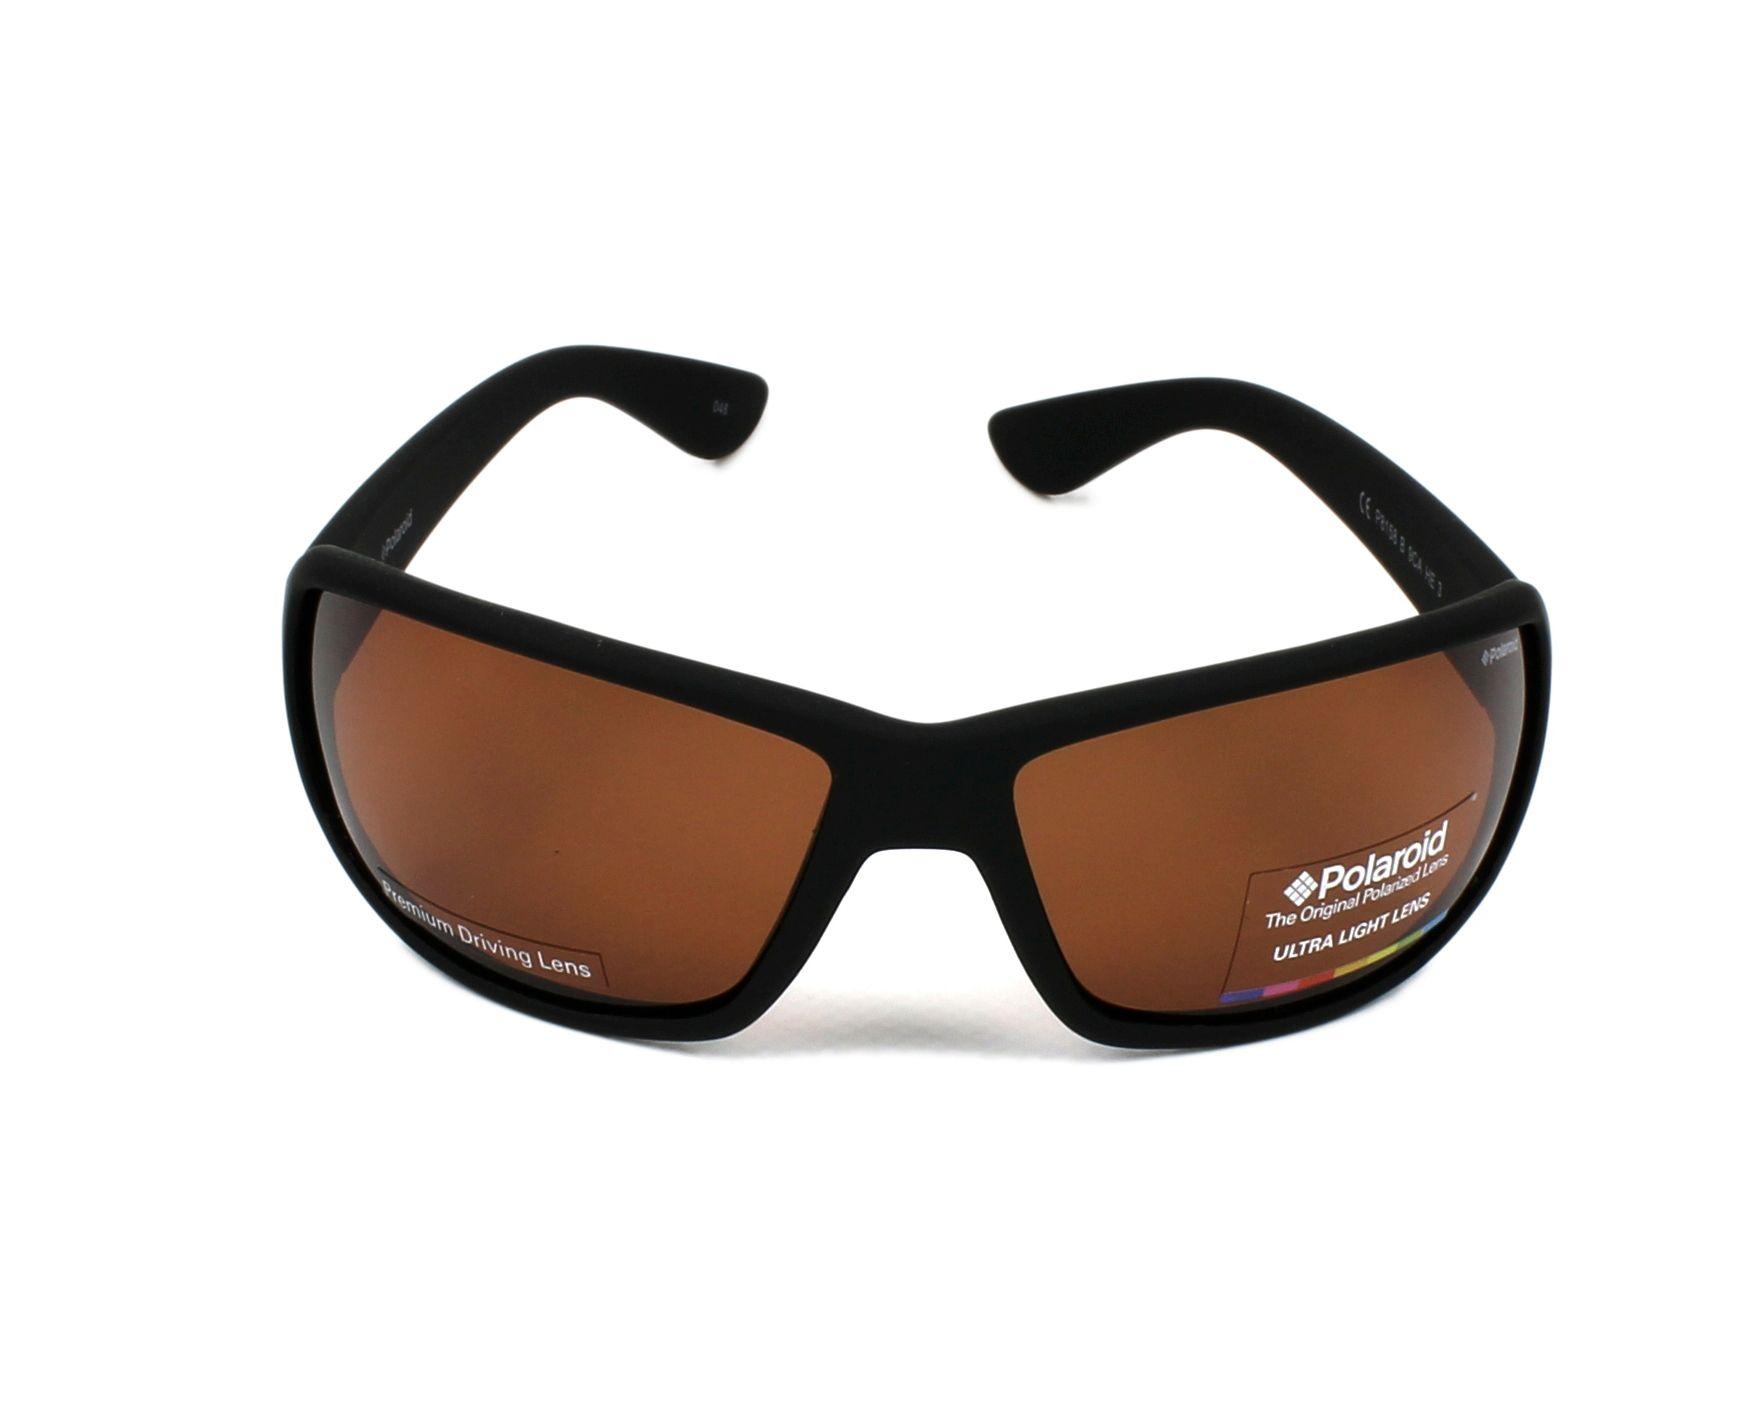 535cd875b3c thumbnail Sunglasses Polaroid P-8158-B 9CA HE - Black front view